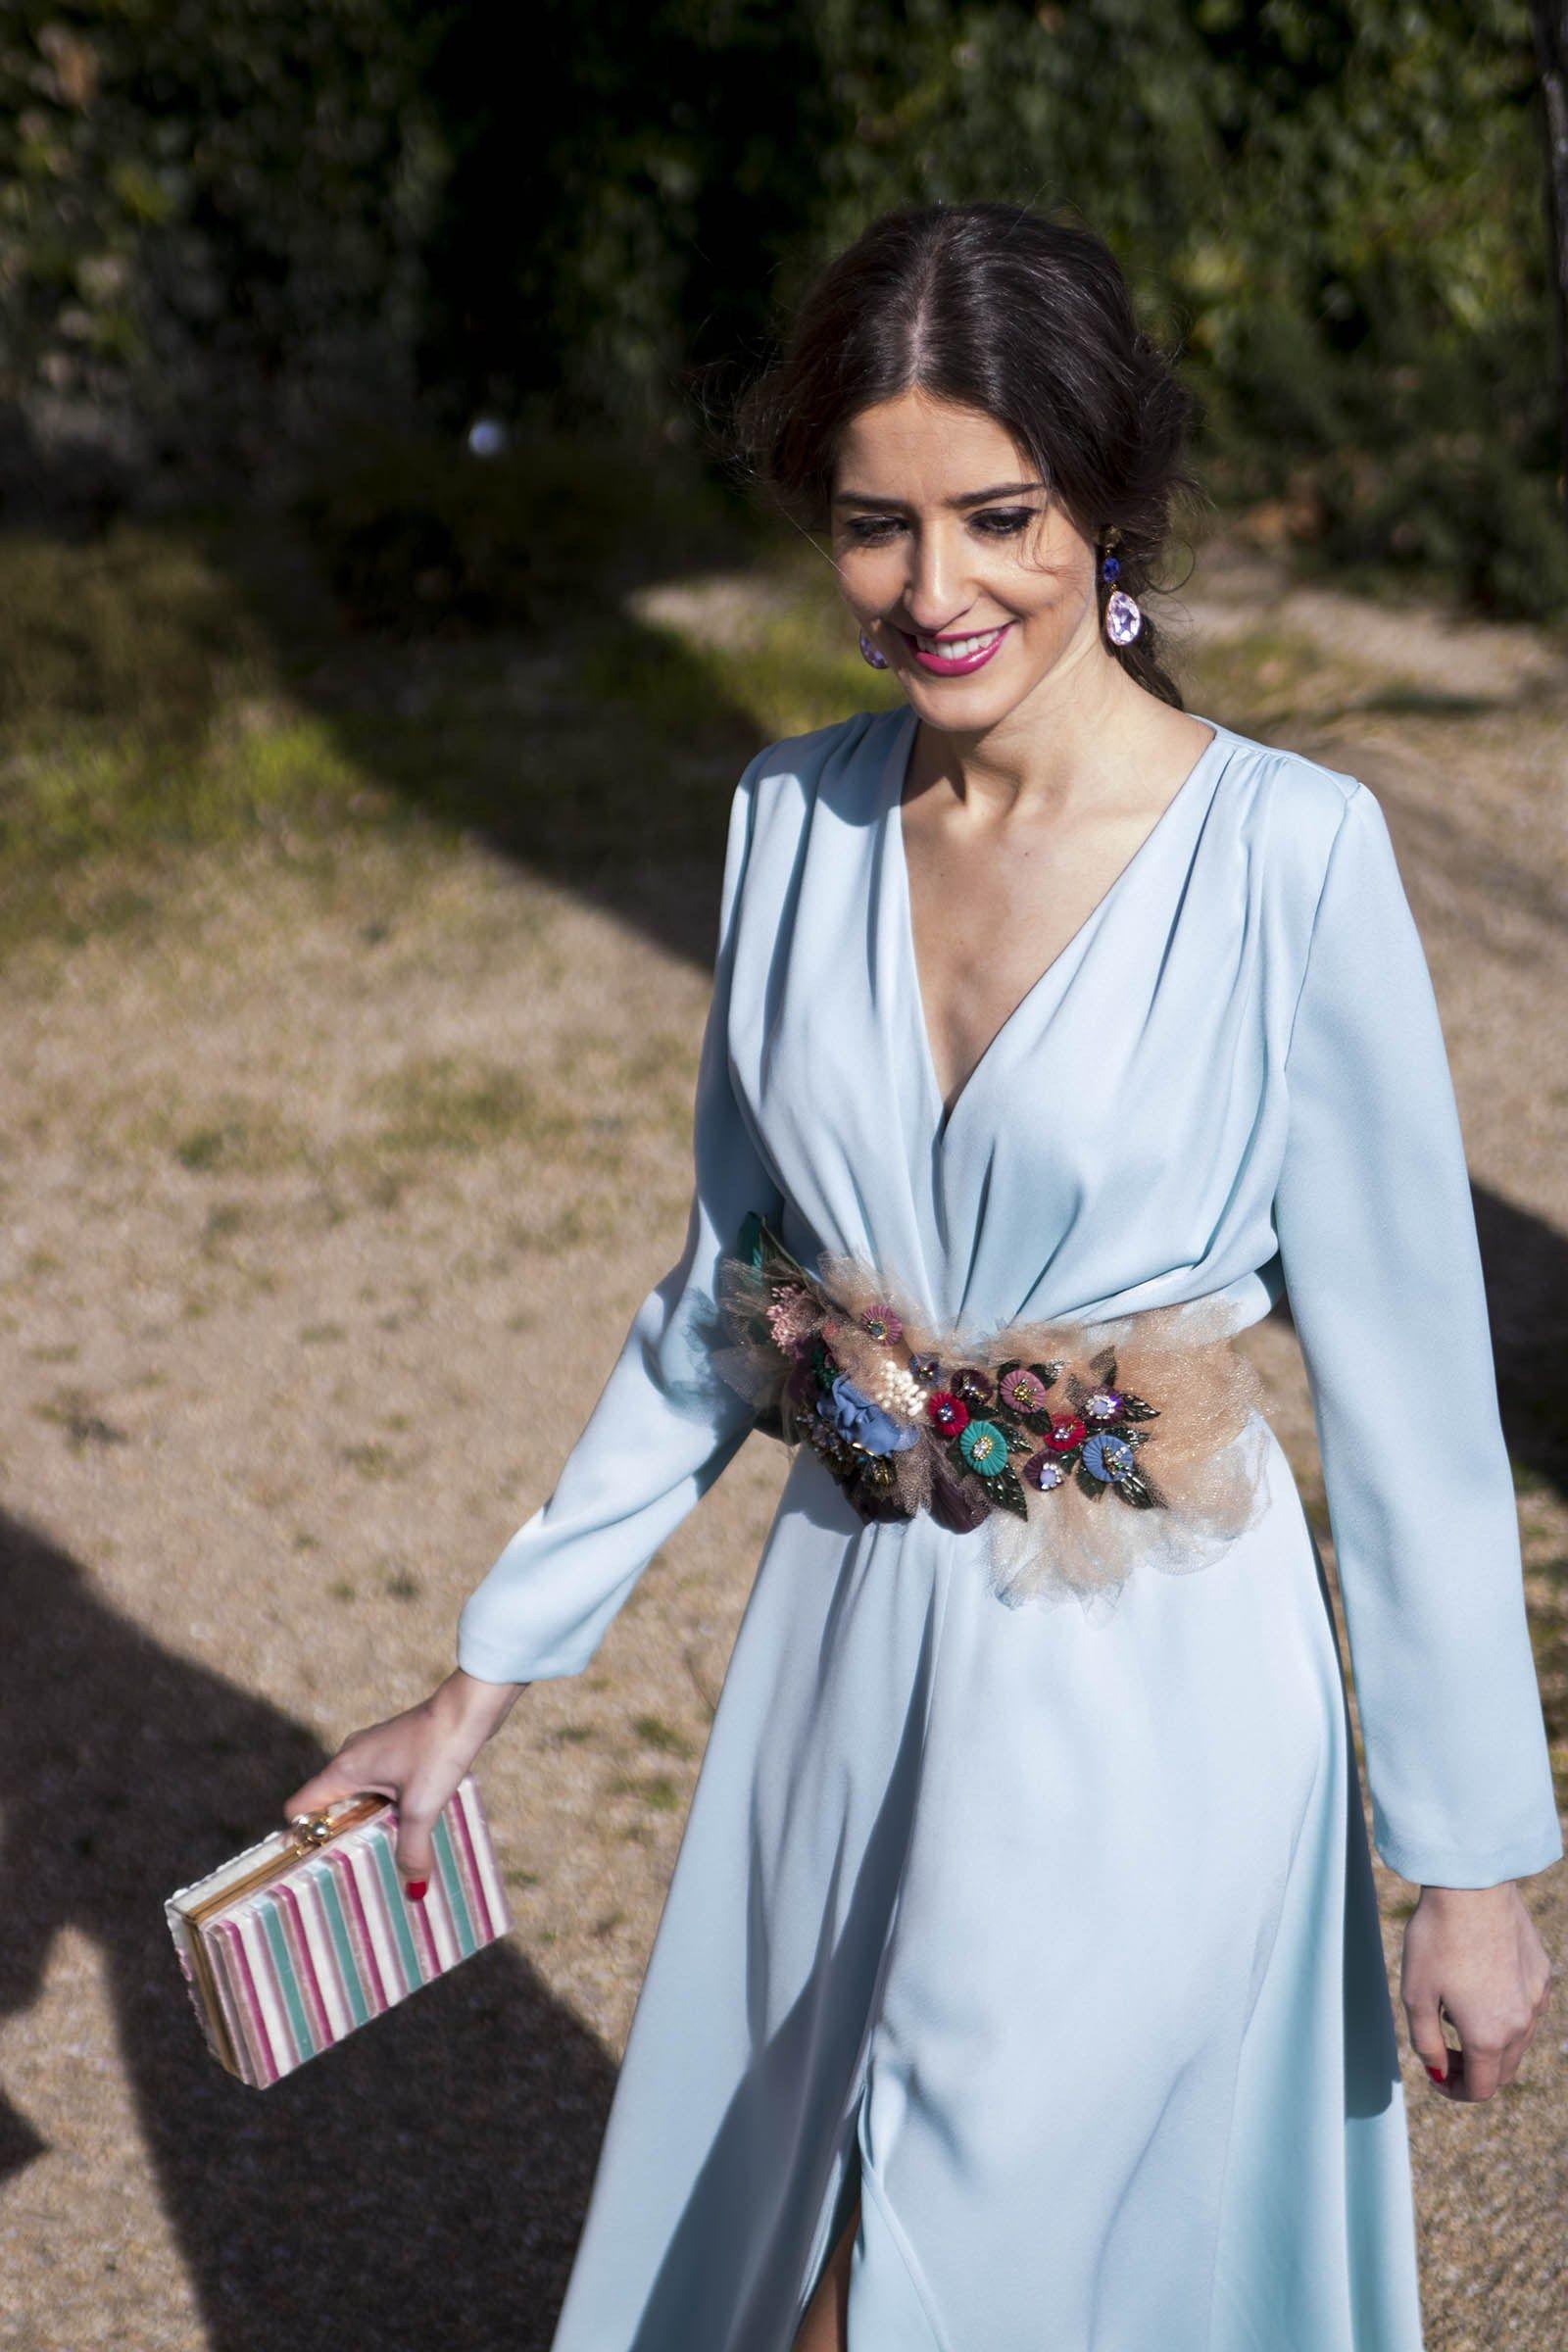 553cff4d6 Inviitada boda noche azul Matilde Cano | VESTIDOS | Vestido boda ...